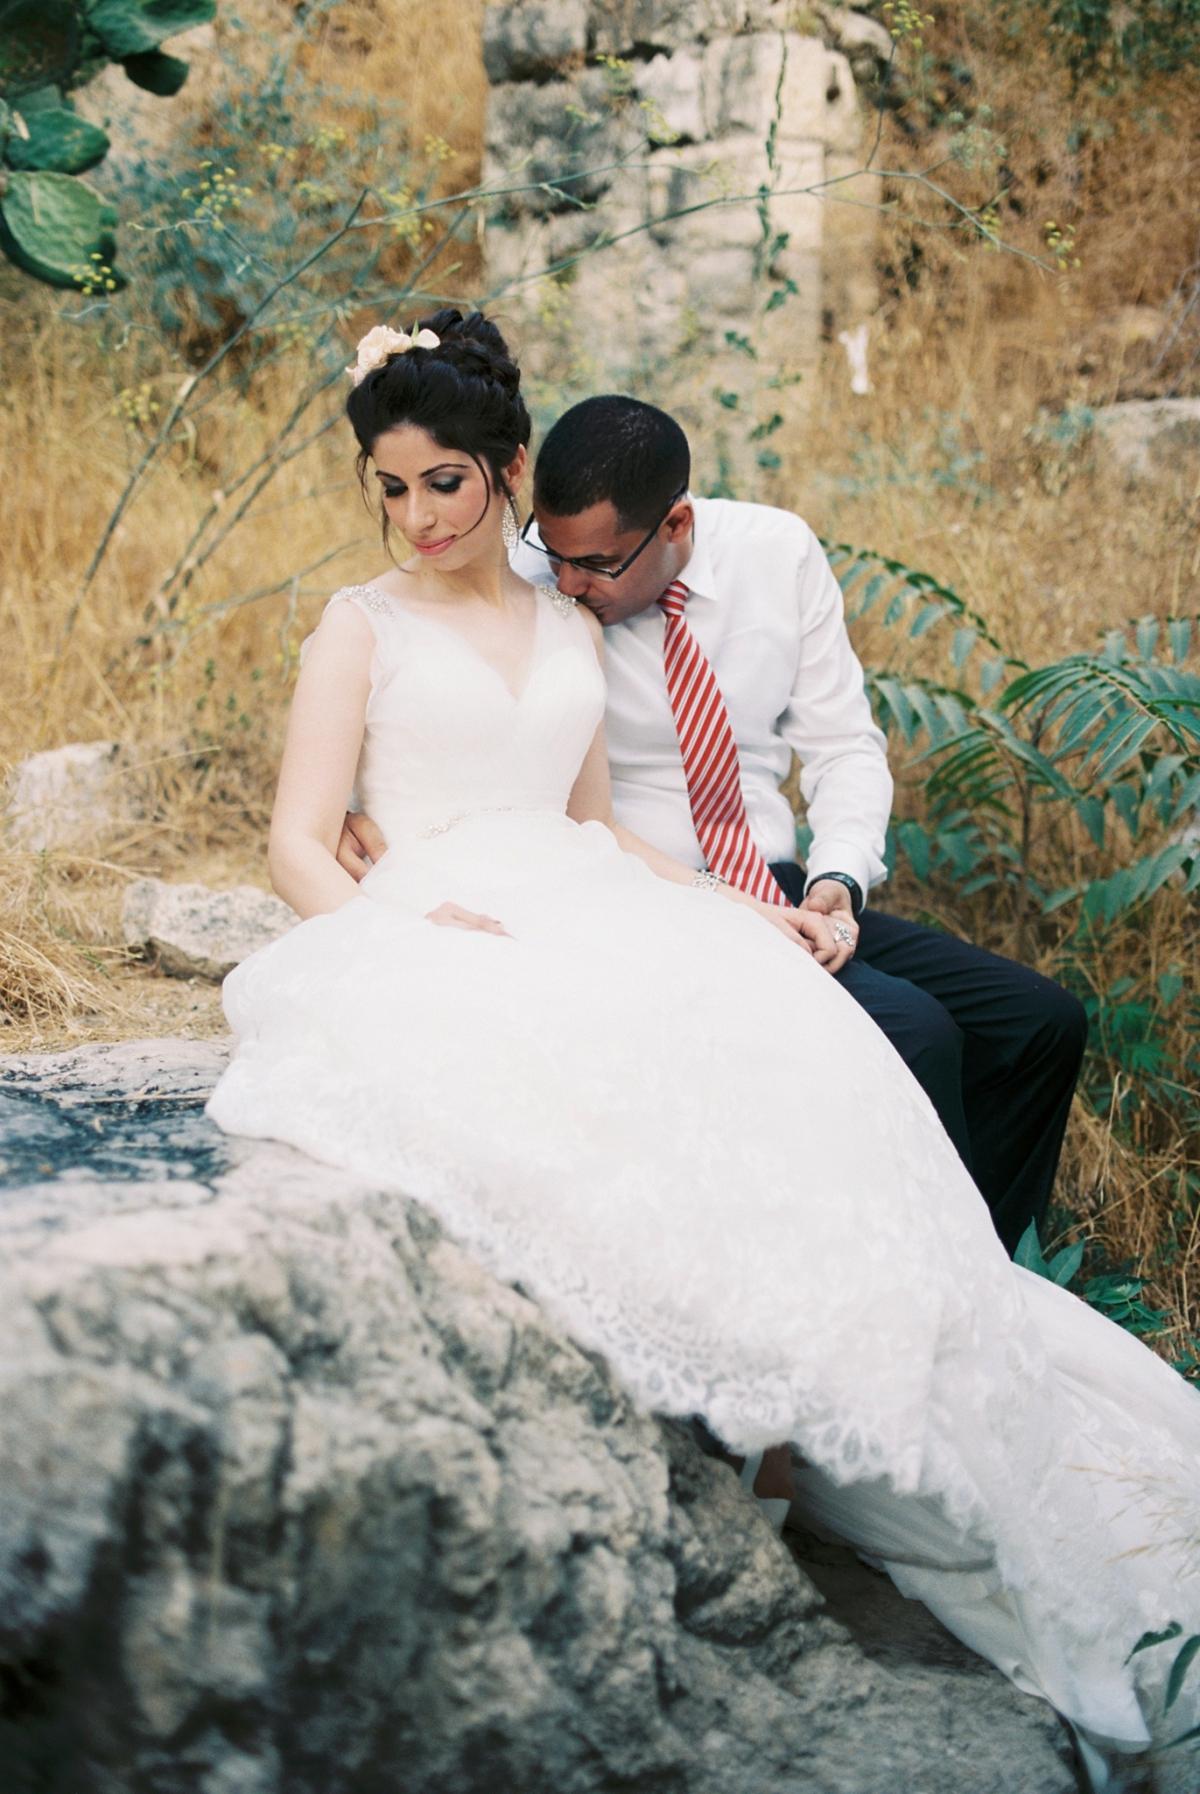 Lifta Bridal Portraits - Jerusalem Israel - Muna and Ali - Sigala Photography_0016